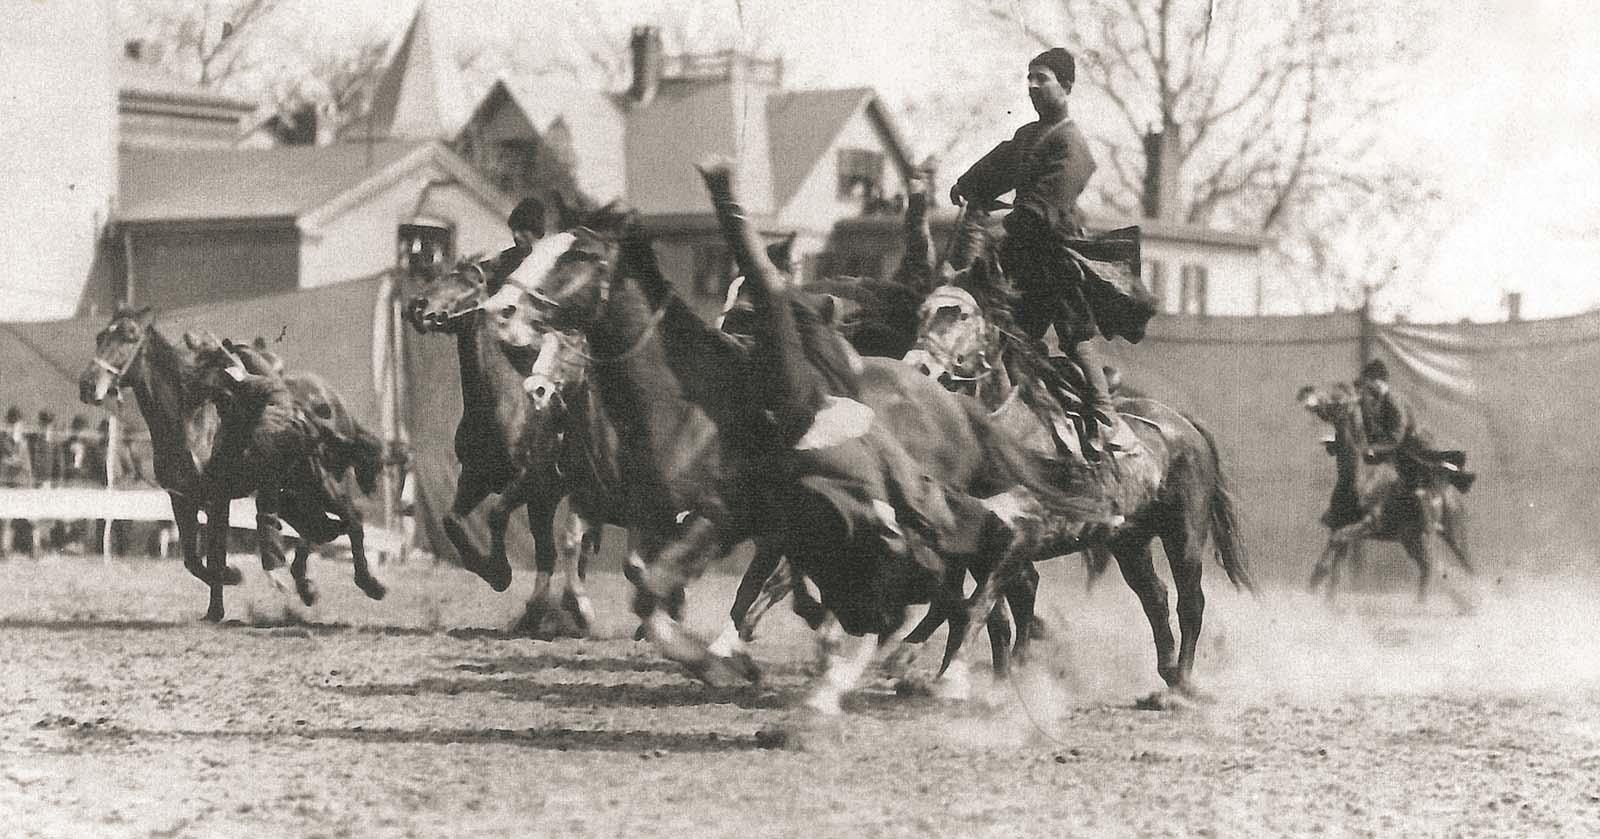 Trick riding, ca. 1902, United States. Collection of Irakli Makharadze.